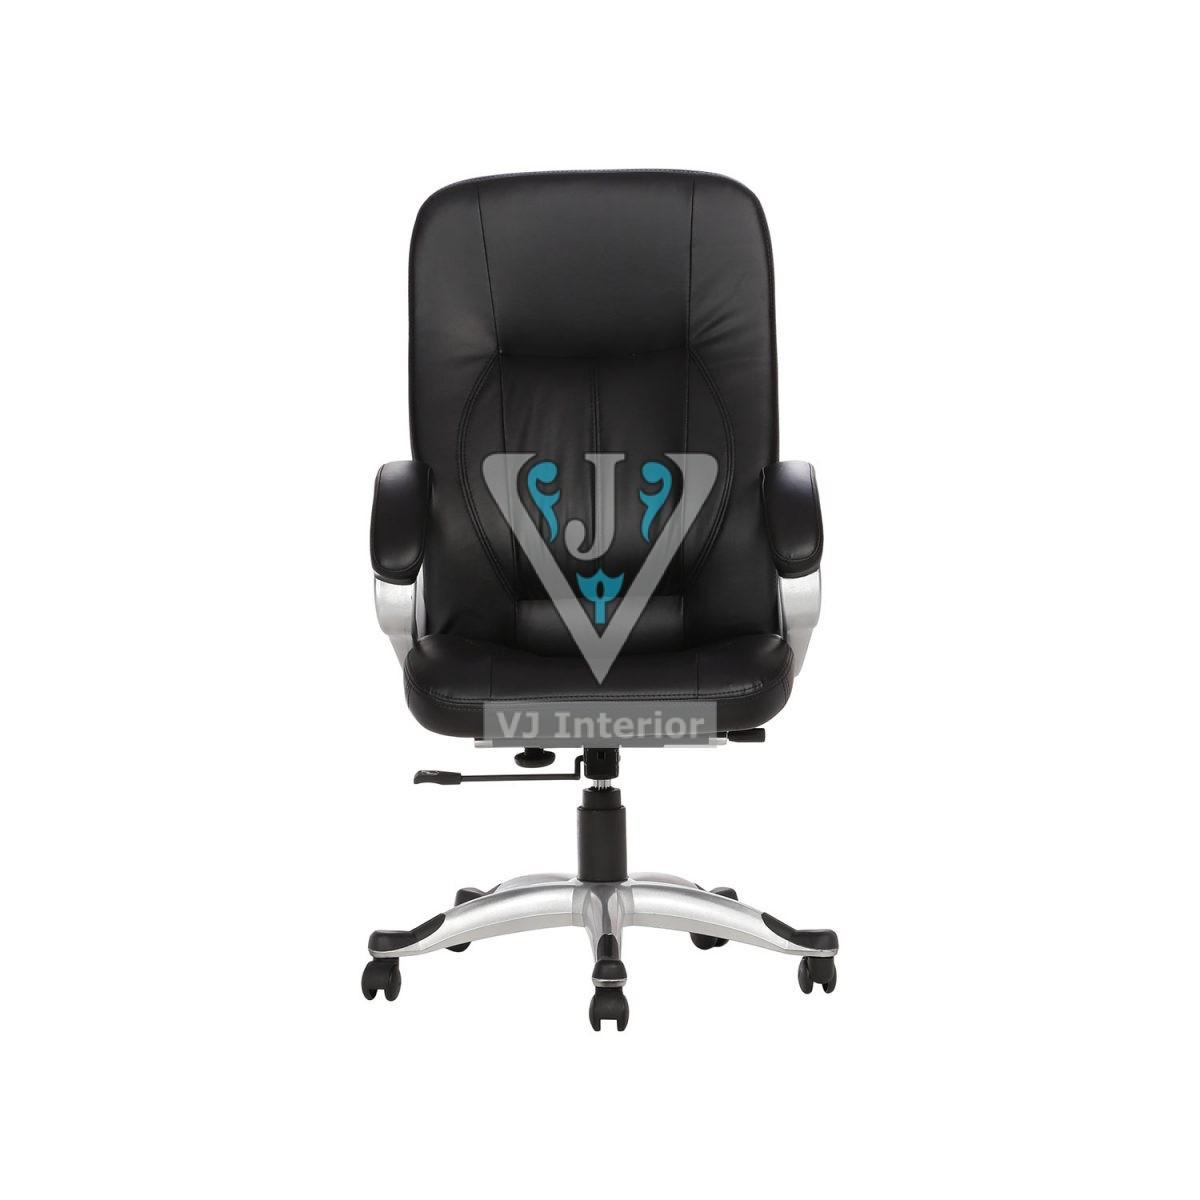 The Jarro Hb Executive Chair Black